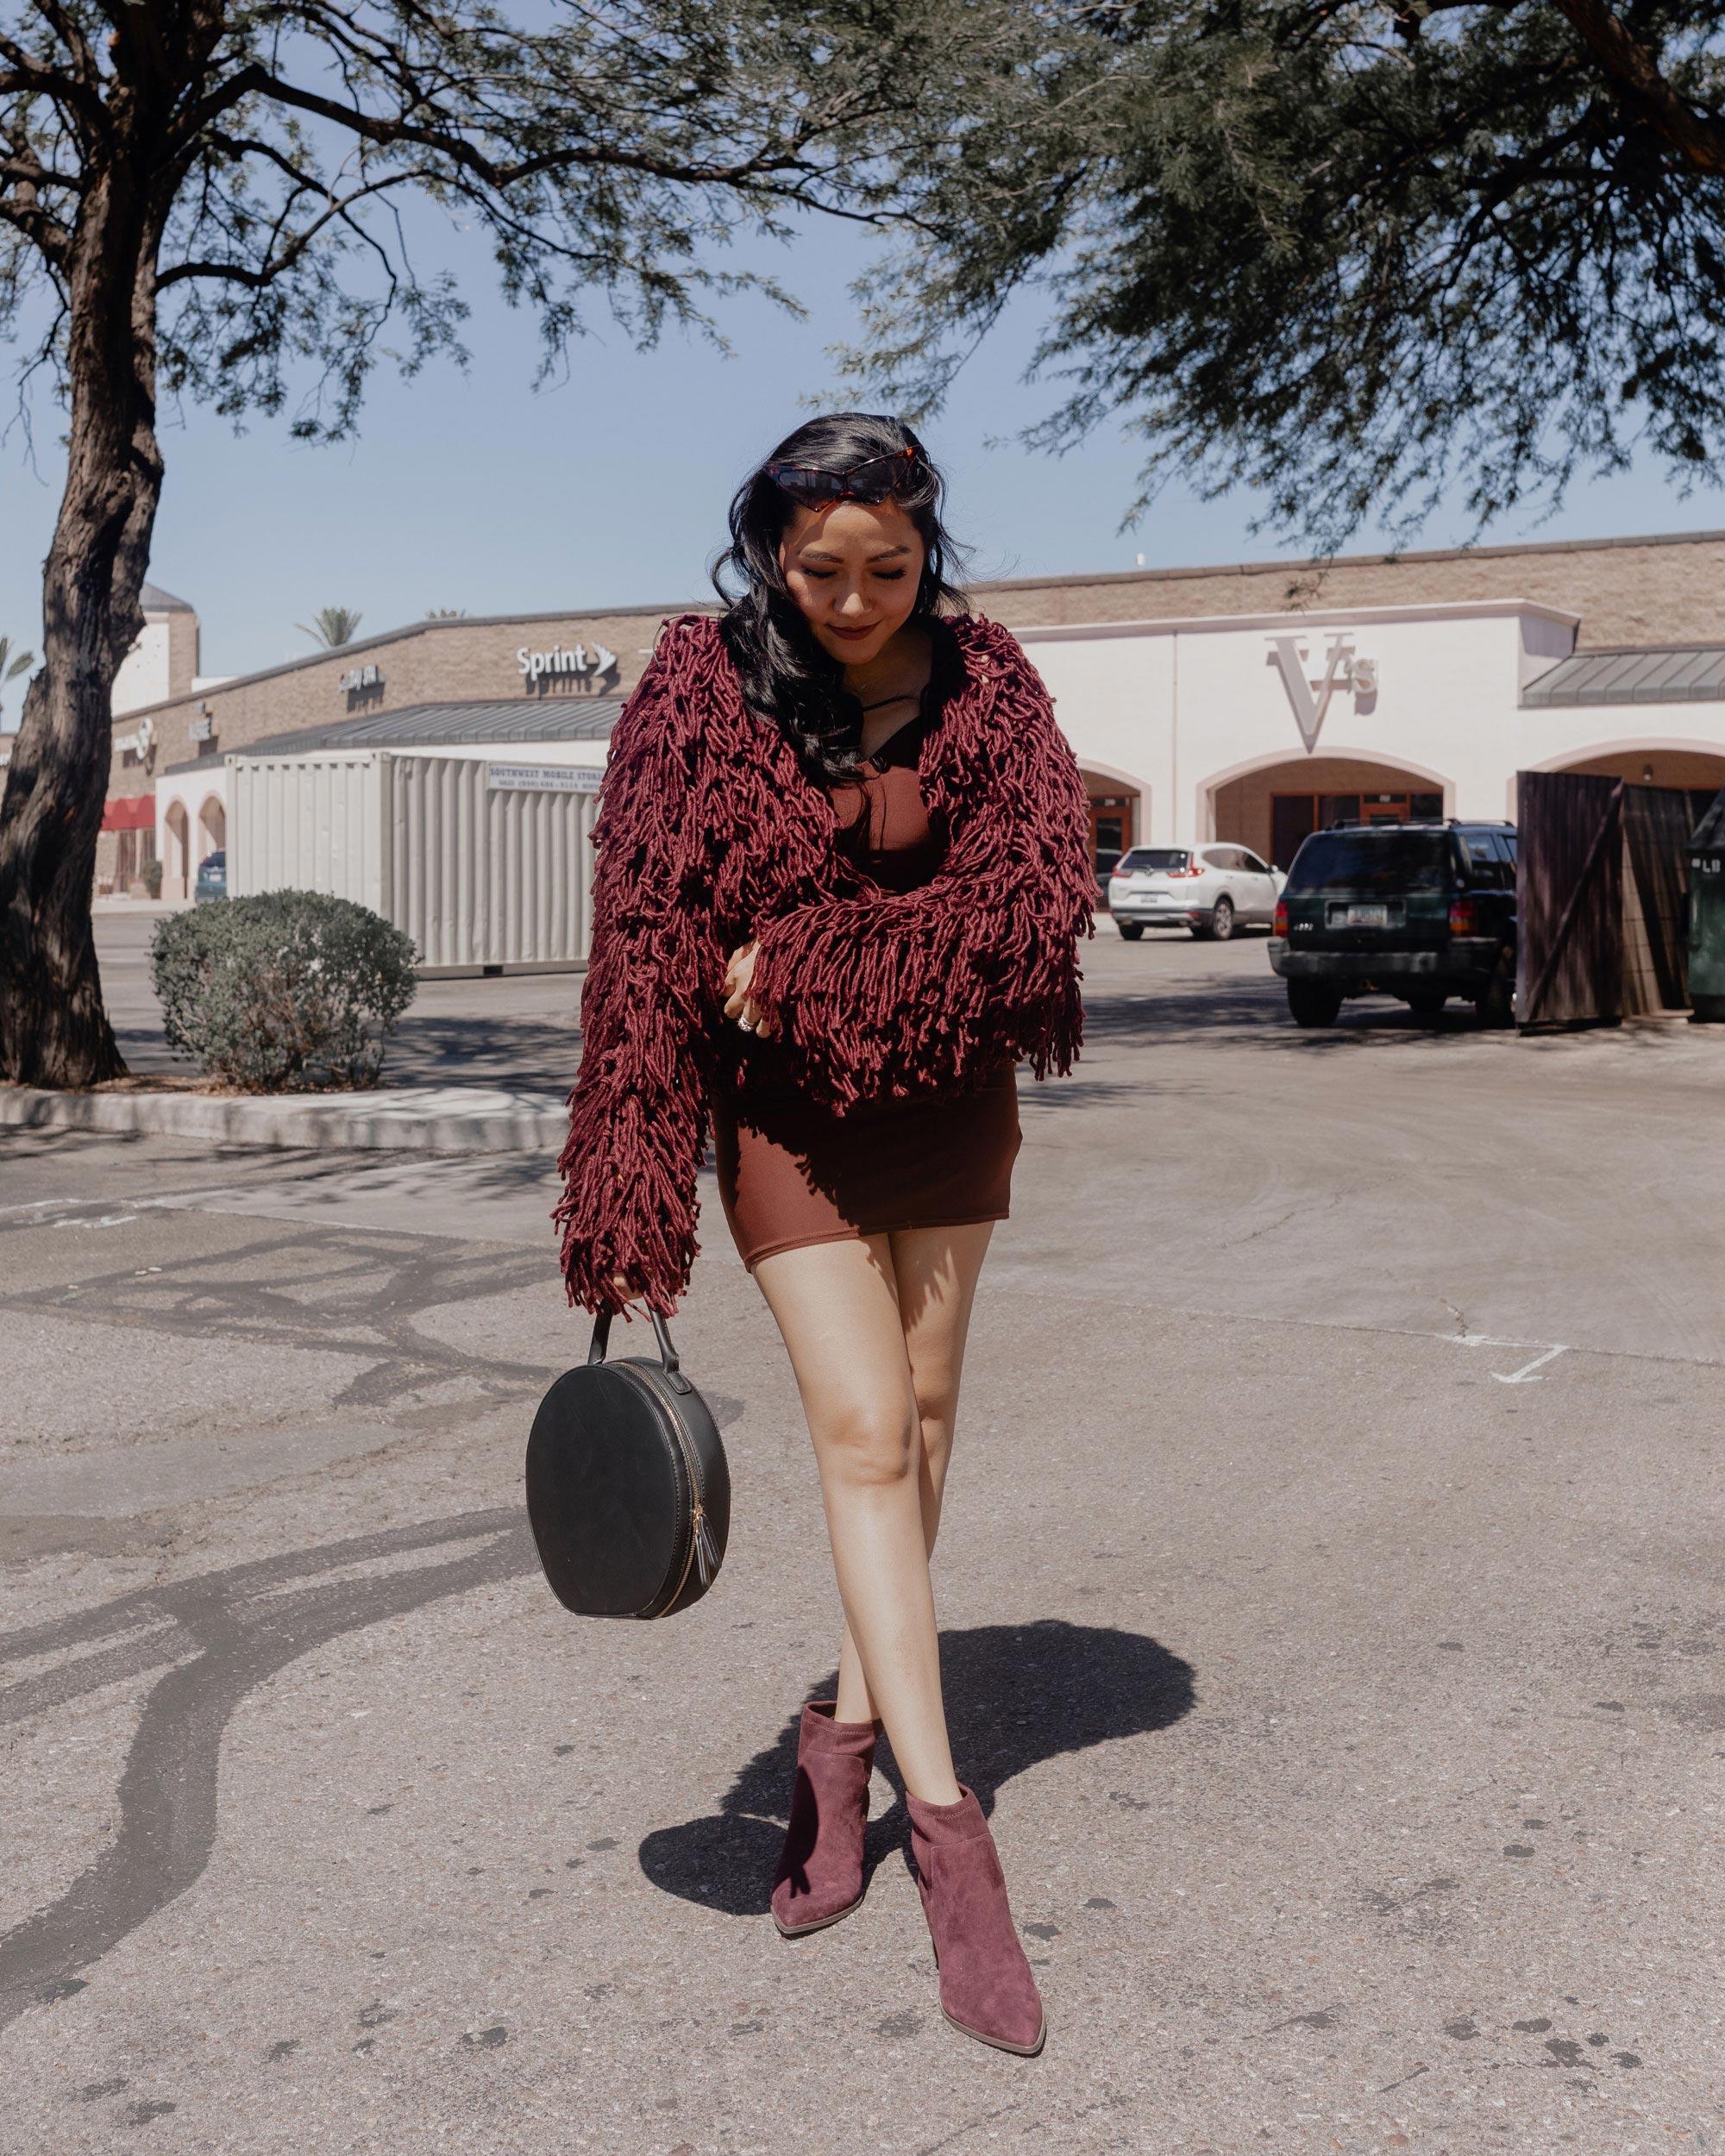 Fall Style | Shaggy Cardigan 3 Ways-brown-soft-touch-slinky-neck-mini-dress_@thevibescloset_allaboutgoodvibes.com_Molly Larsen